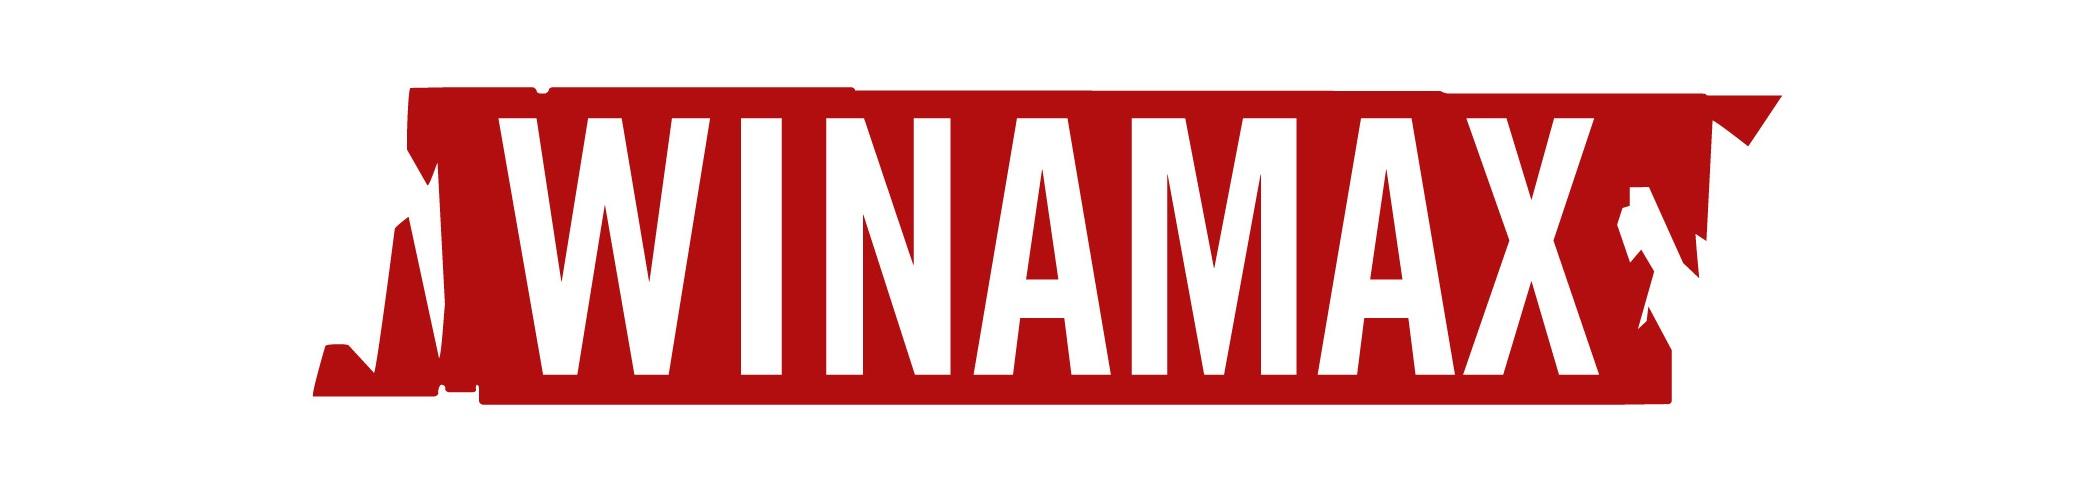 logo_winamax_long